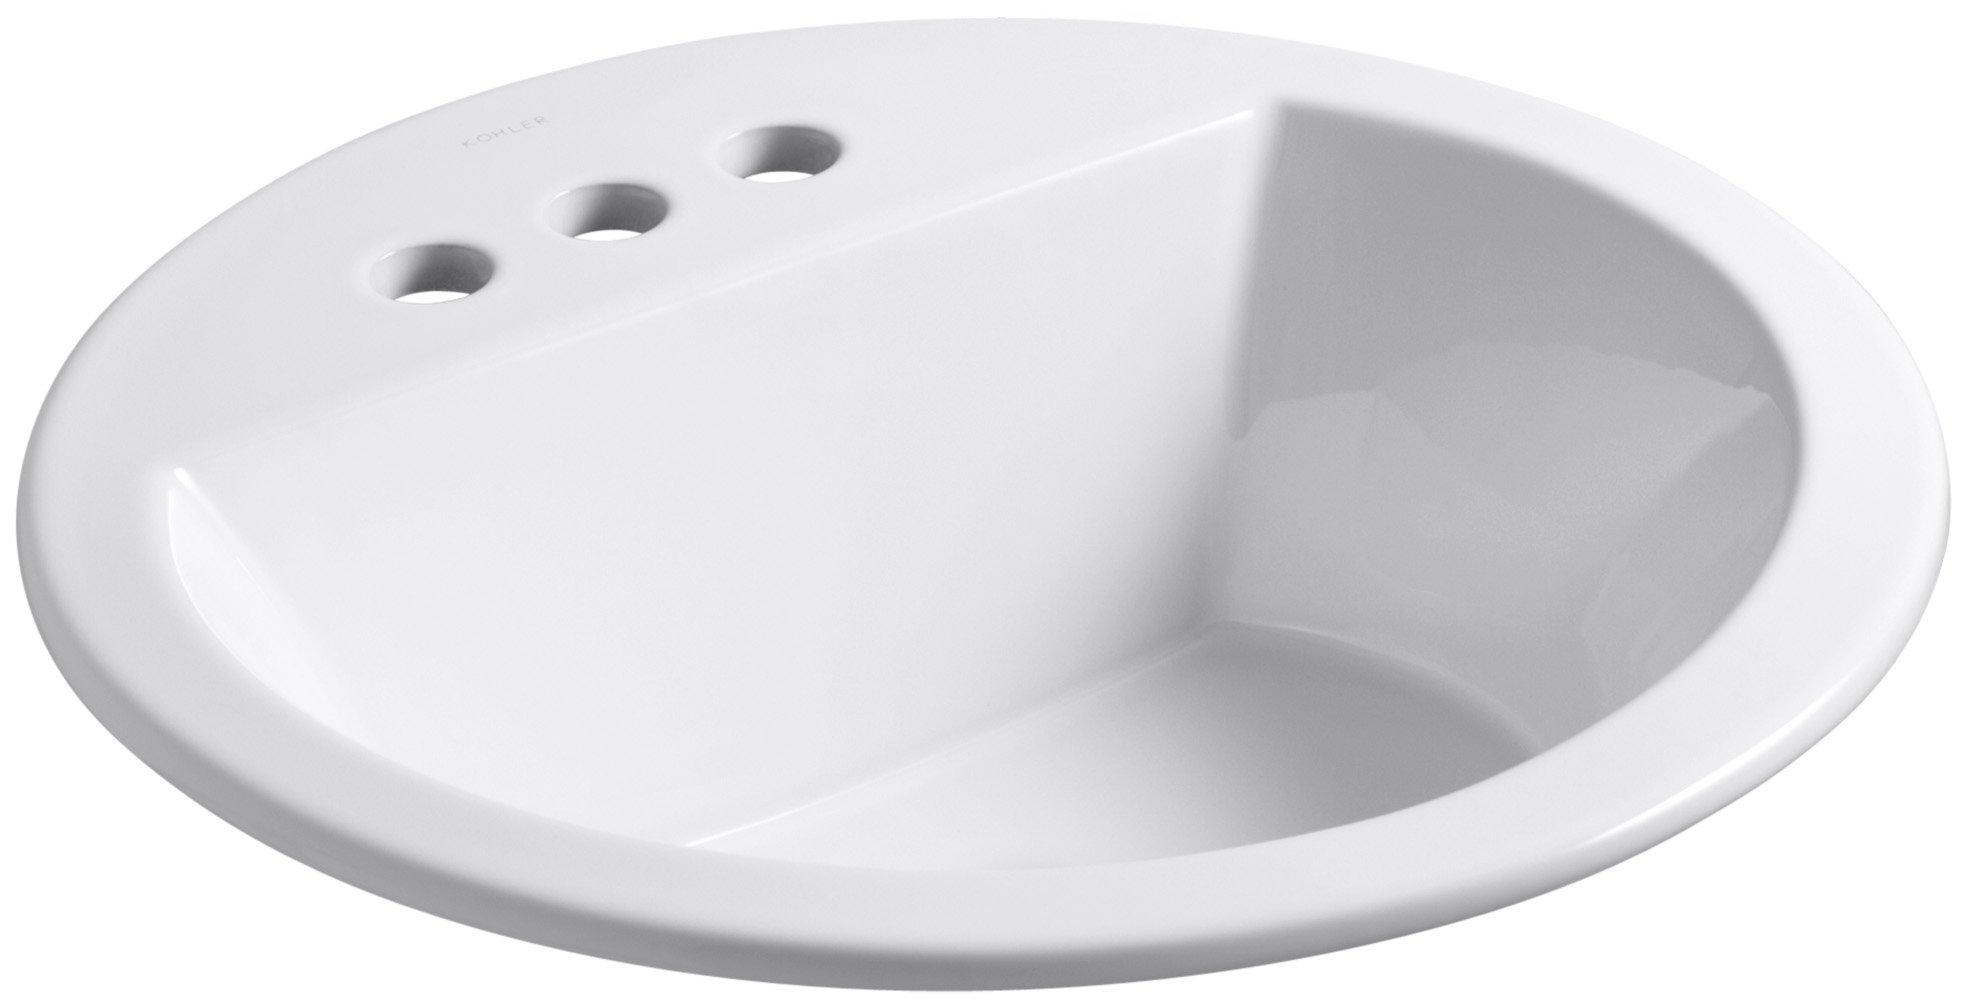 KOHLER K-2714-4-0 Bryant Round Self-Rimming Bathroom Sink with 4-Inch Centers, White